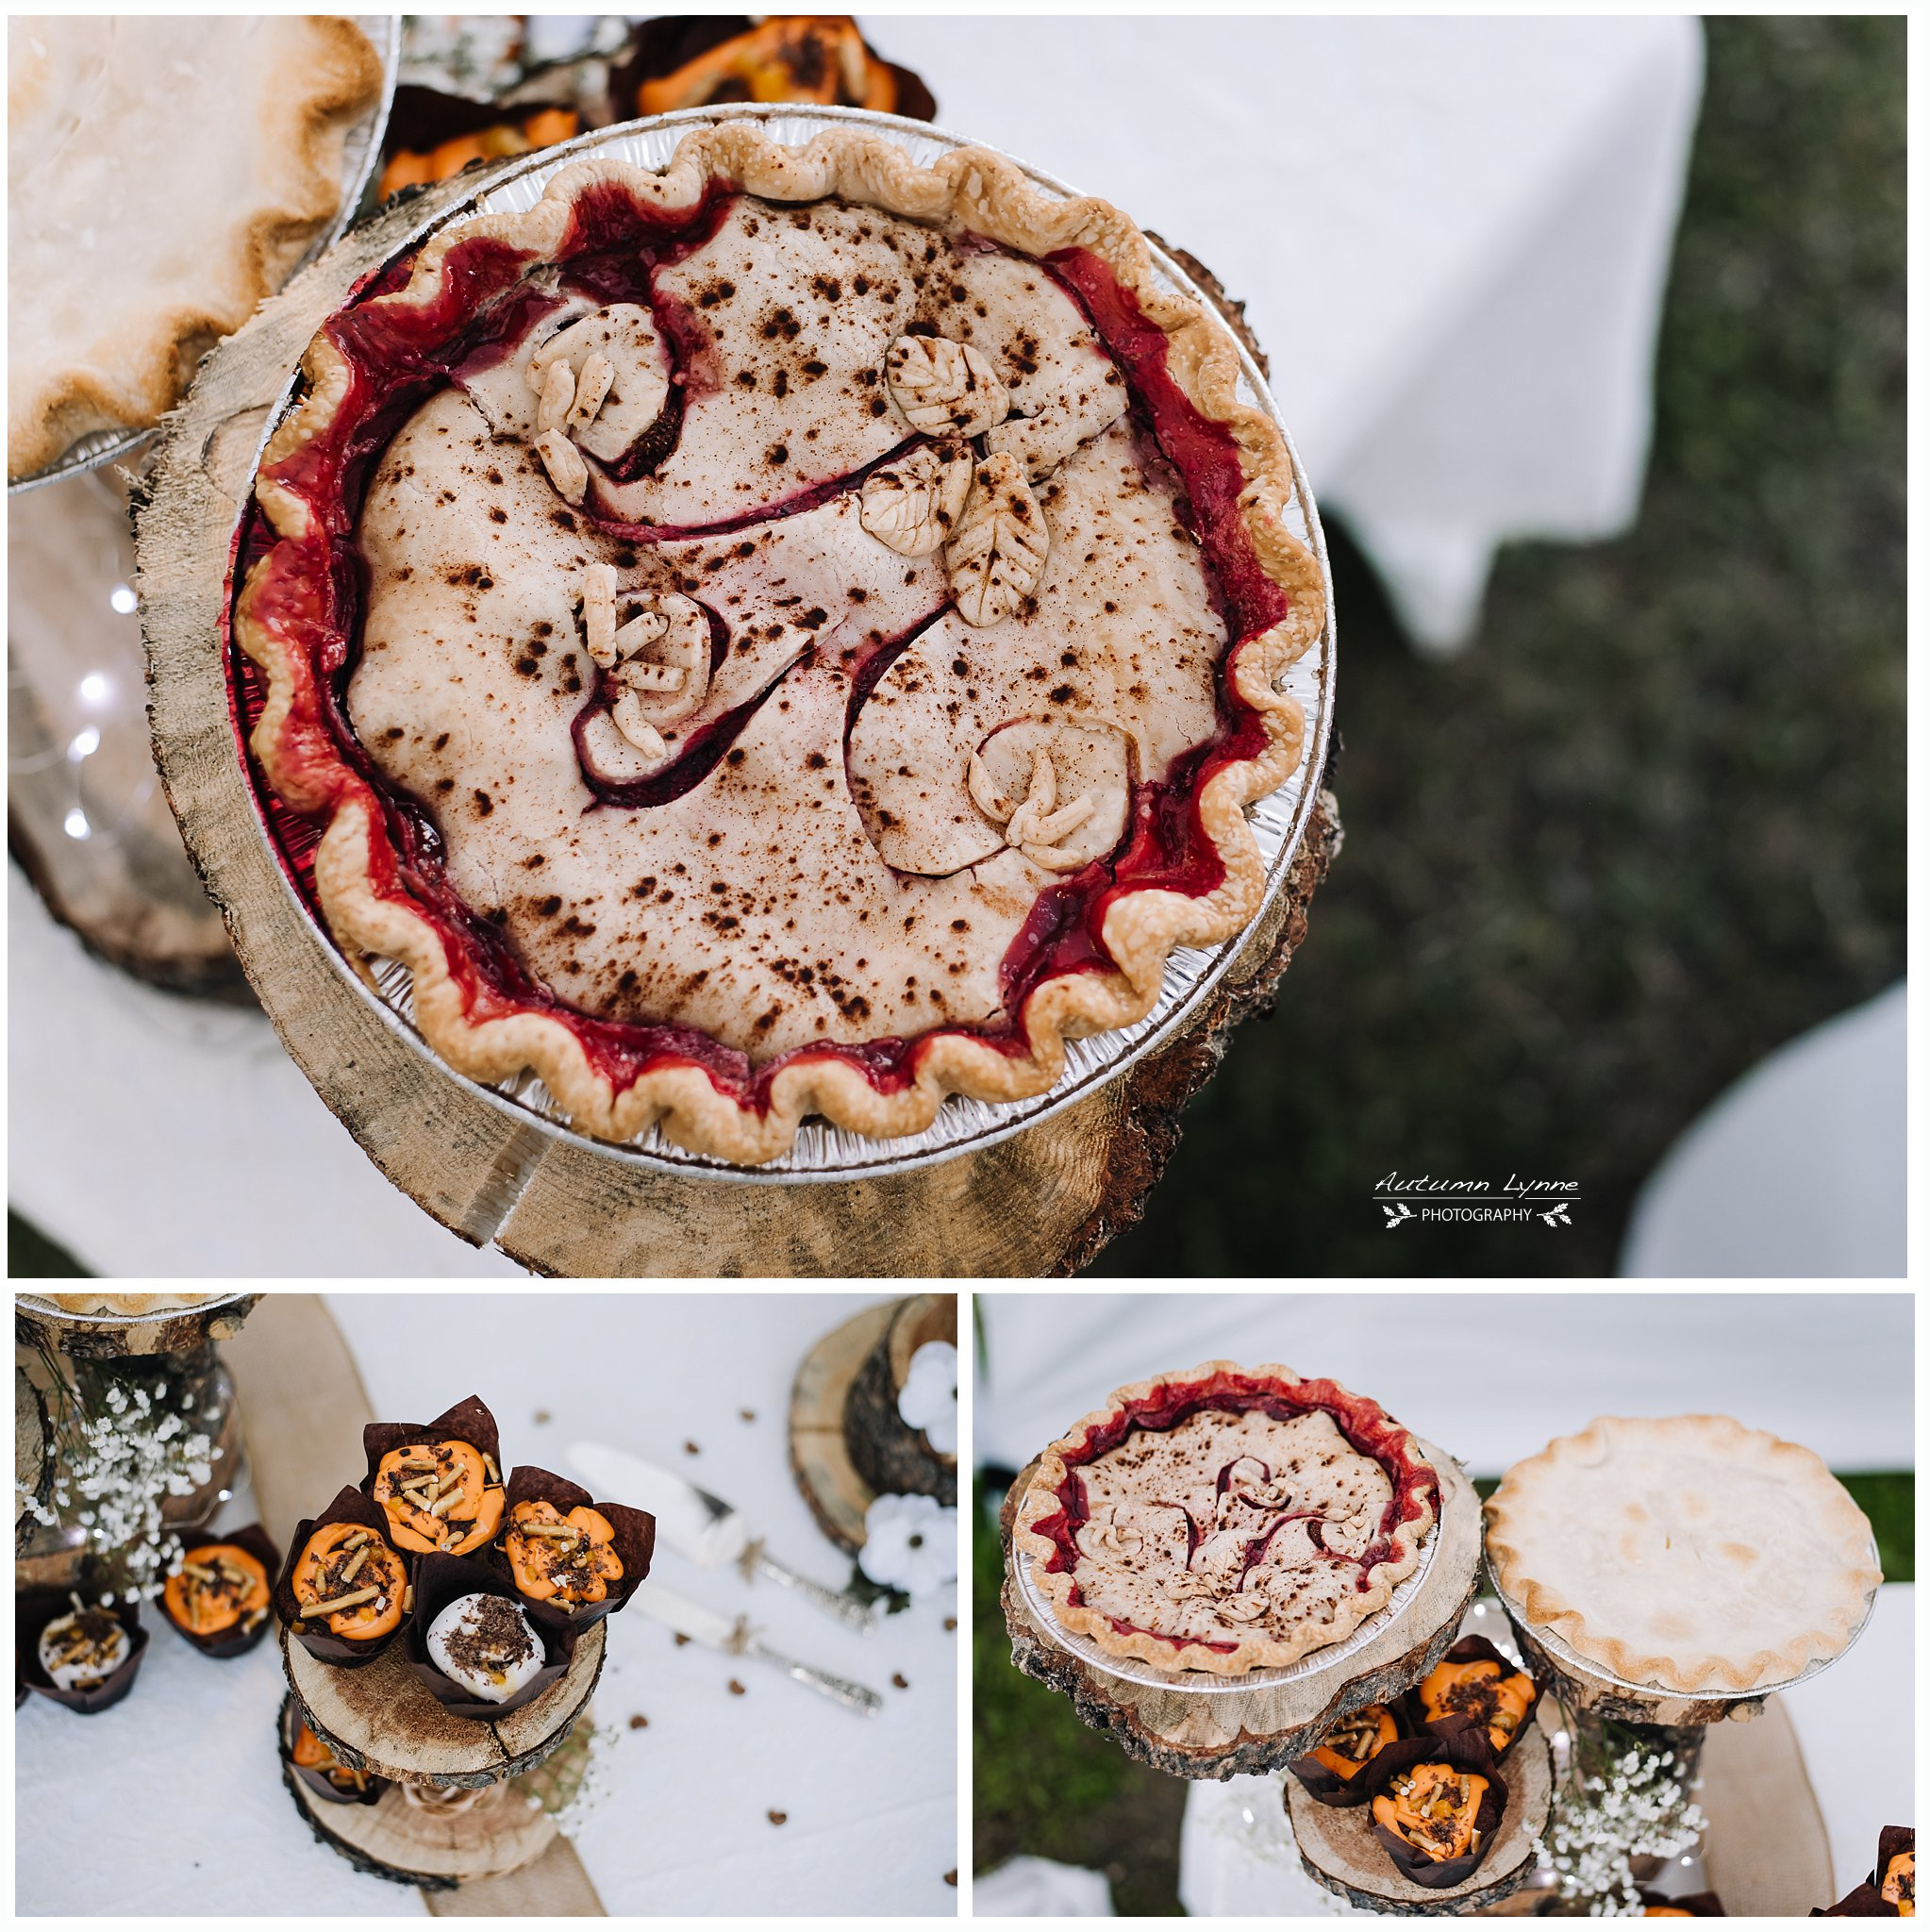 Wedding cake. wedding reception with pies. wedding pies. McCall idaho wedding. wedding photography